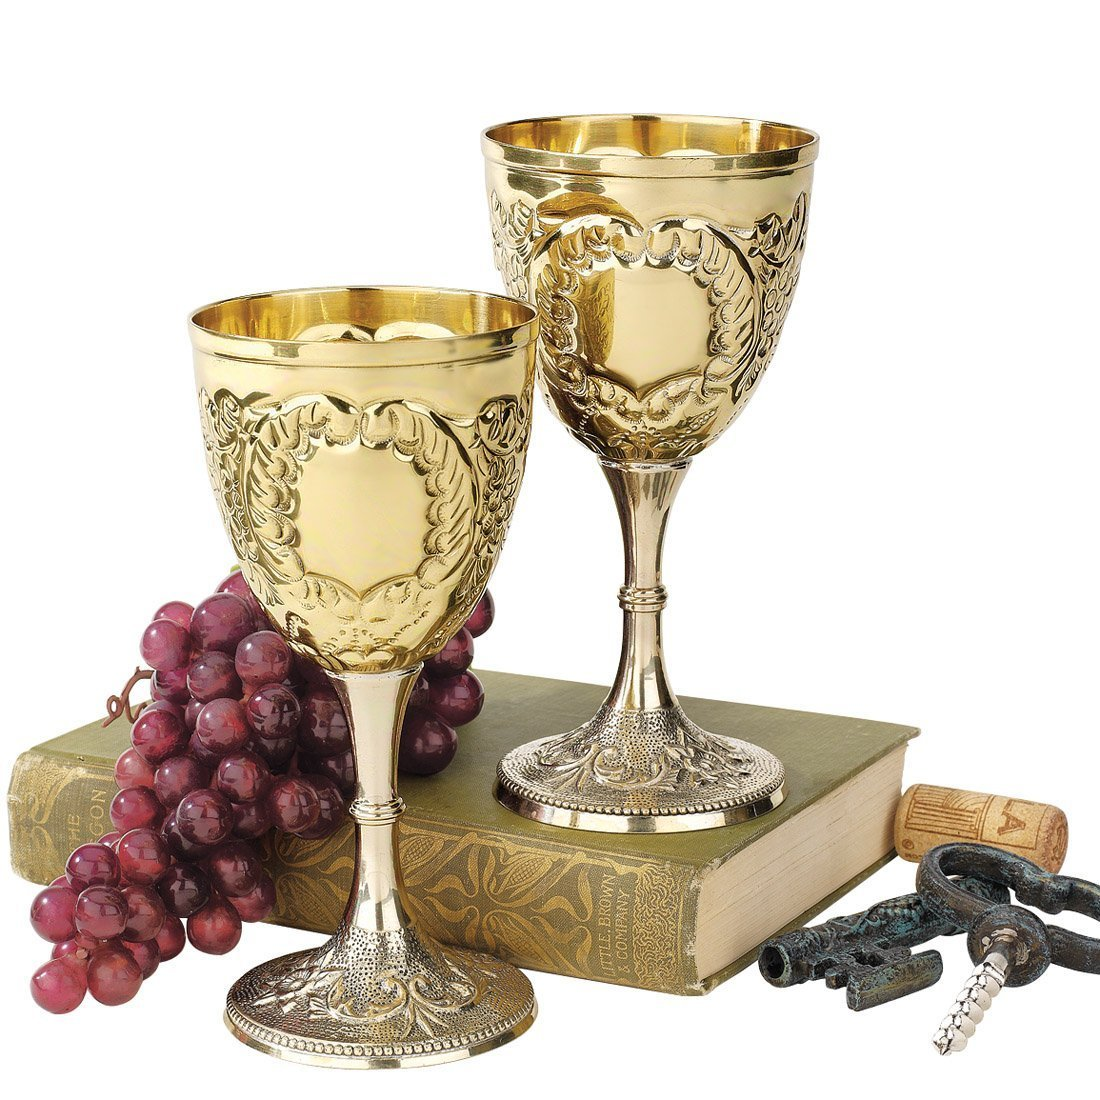 Design Toscano The King's Royal Chalice Embossed Brass Goblet (Set of 2) TV98004